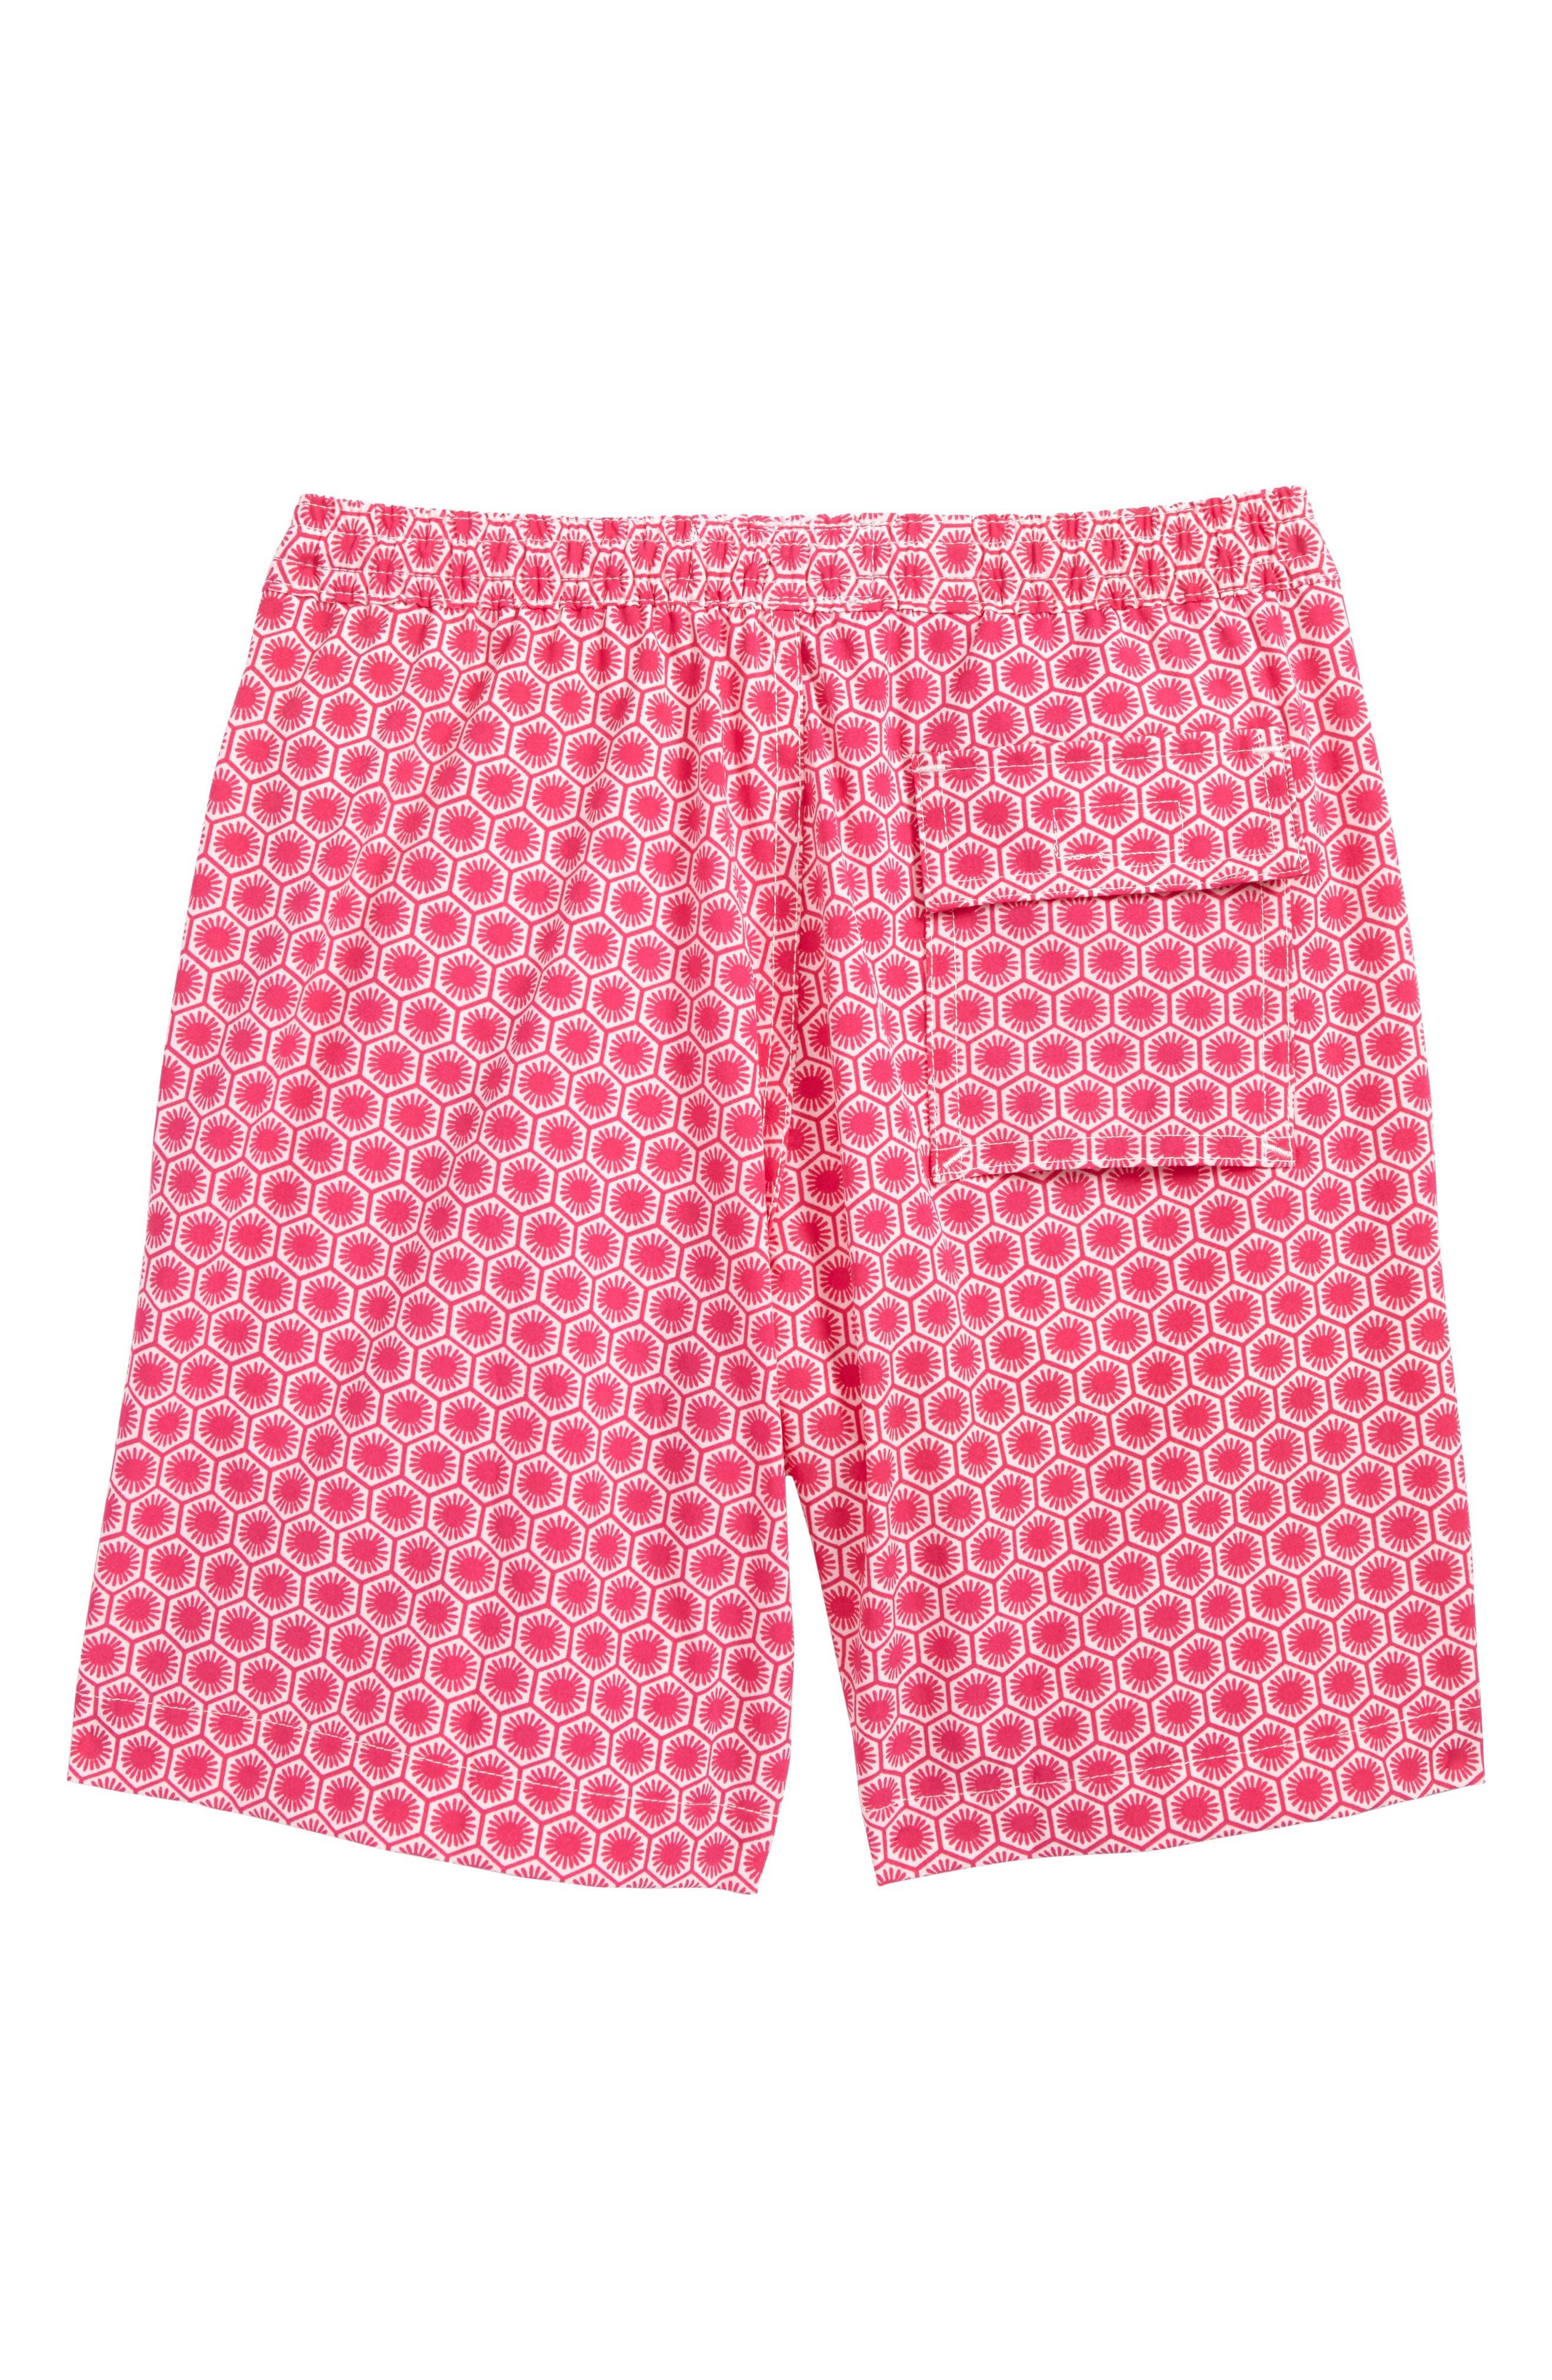 Alternate Image 2  - Psycho Bunny Honeycomb Board Shorts (Little Boys & Big Boys)